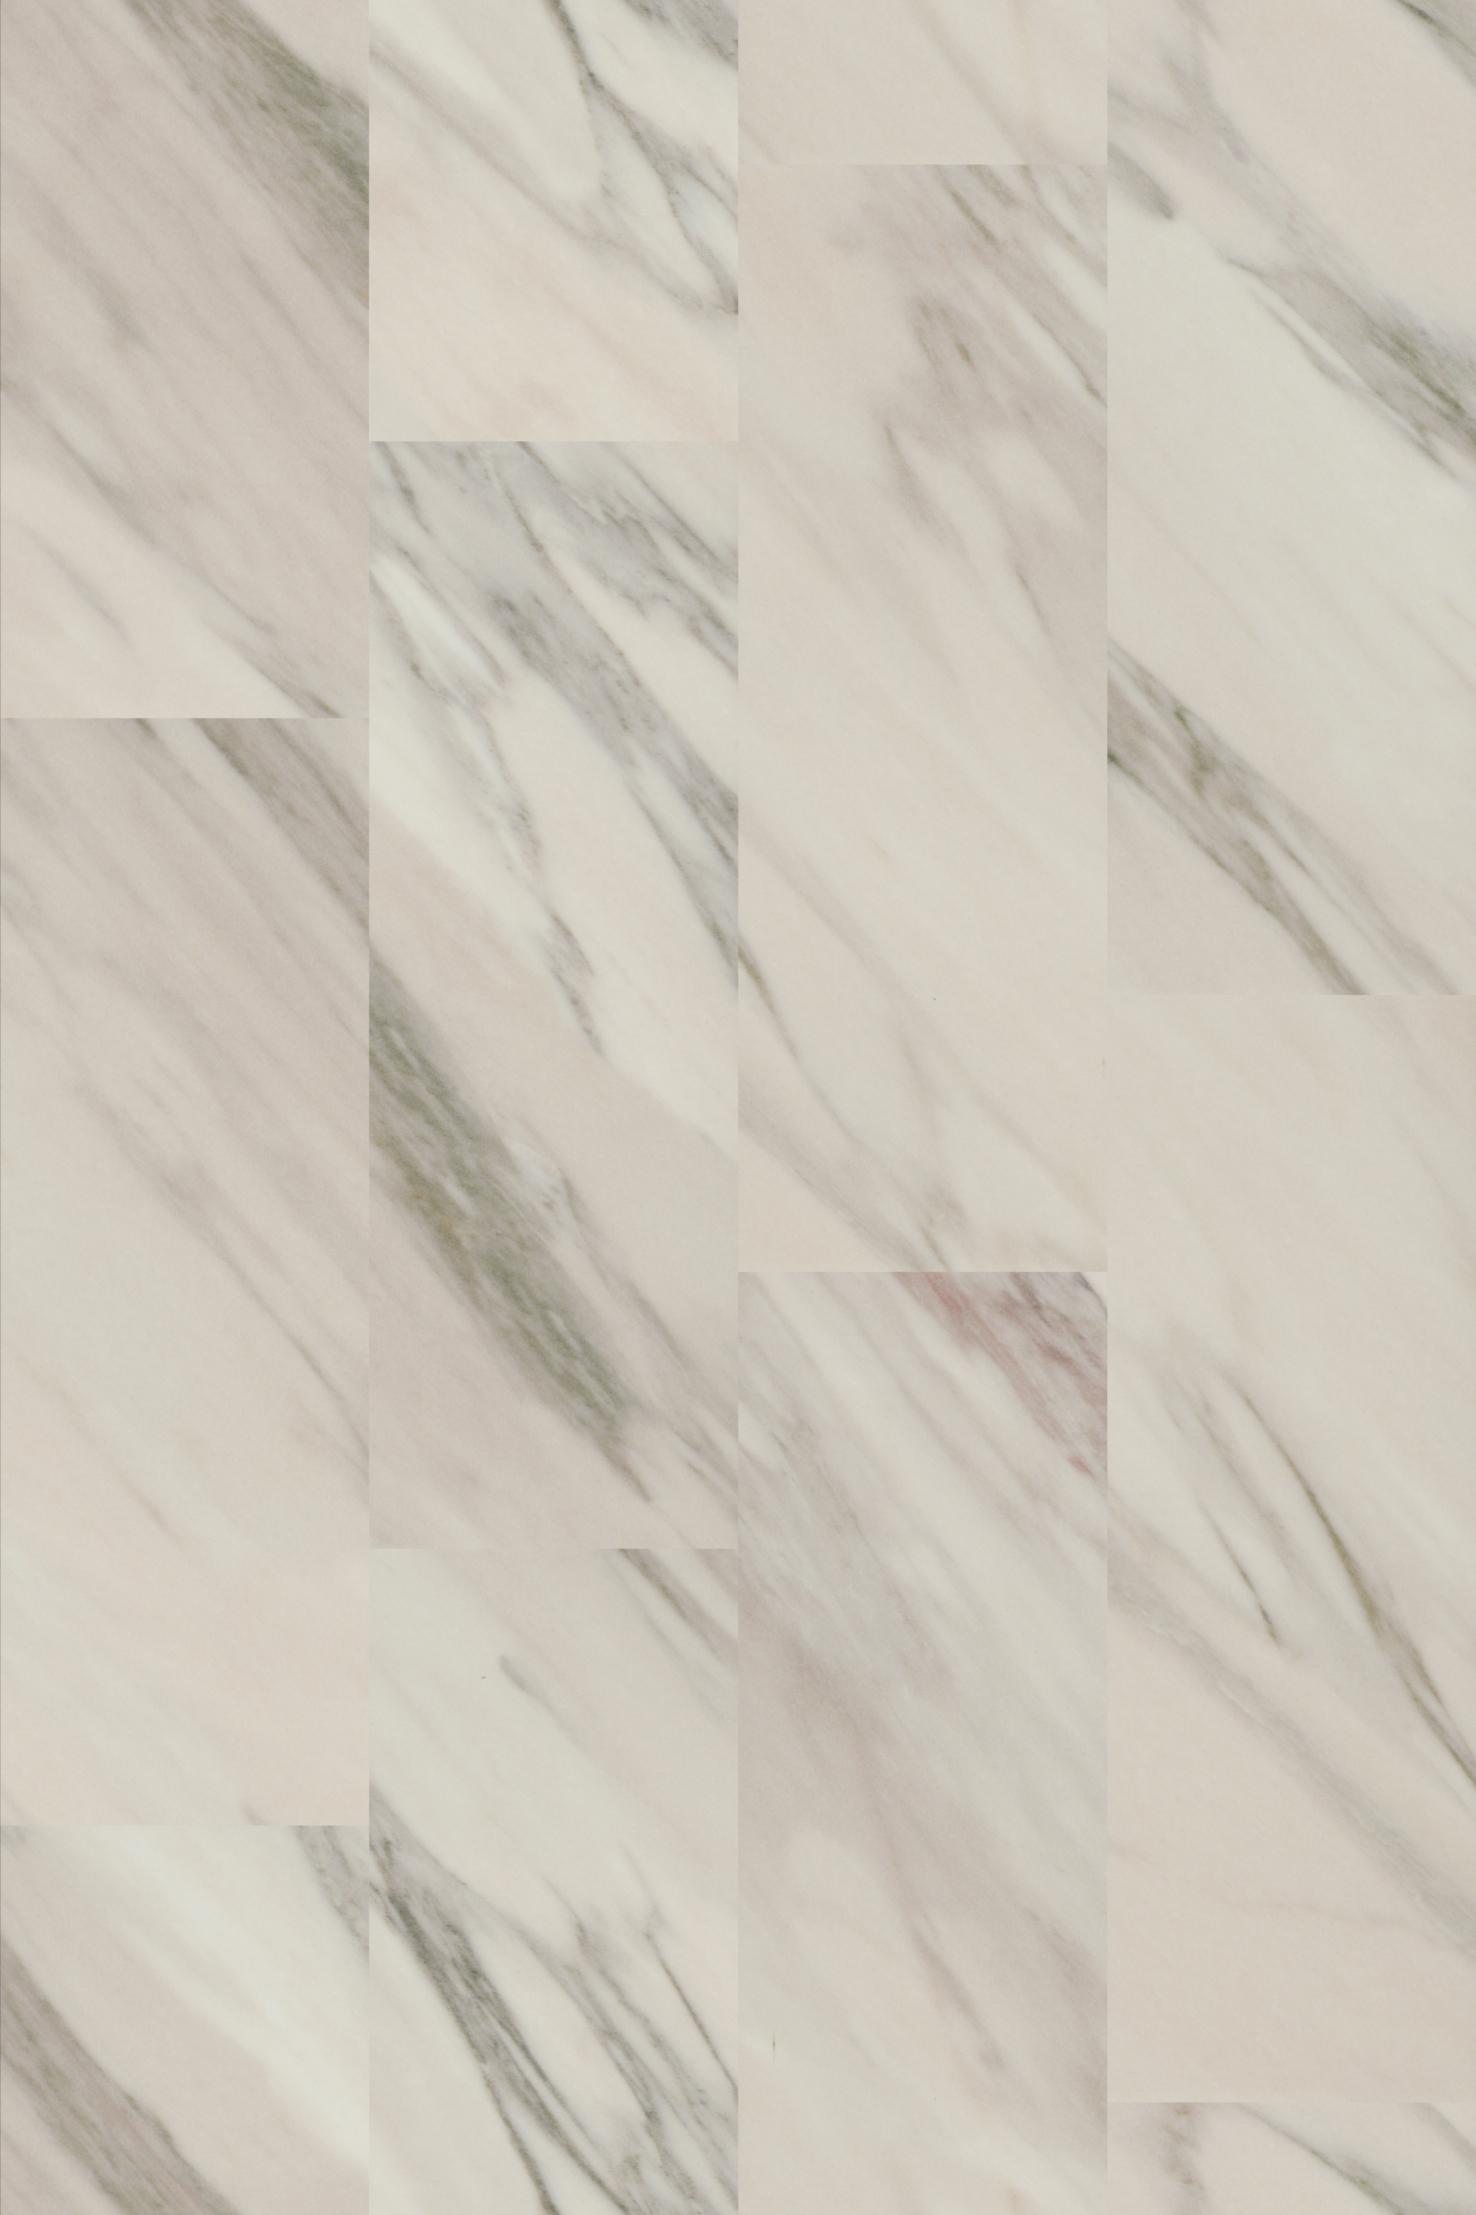 Allura_Stone_-s62580_aurora_marble